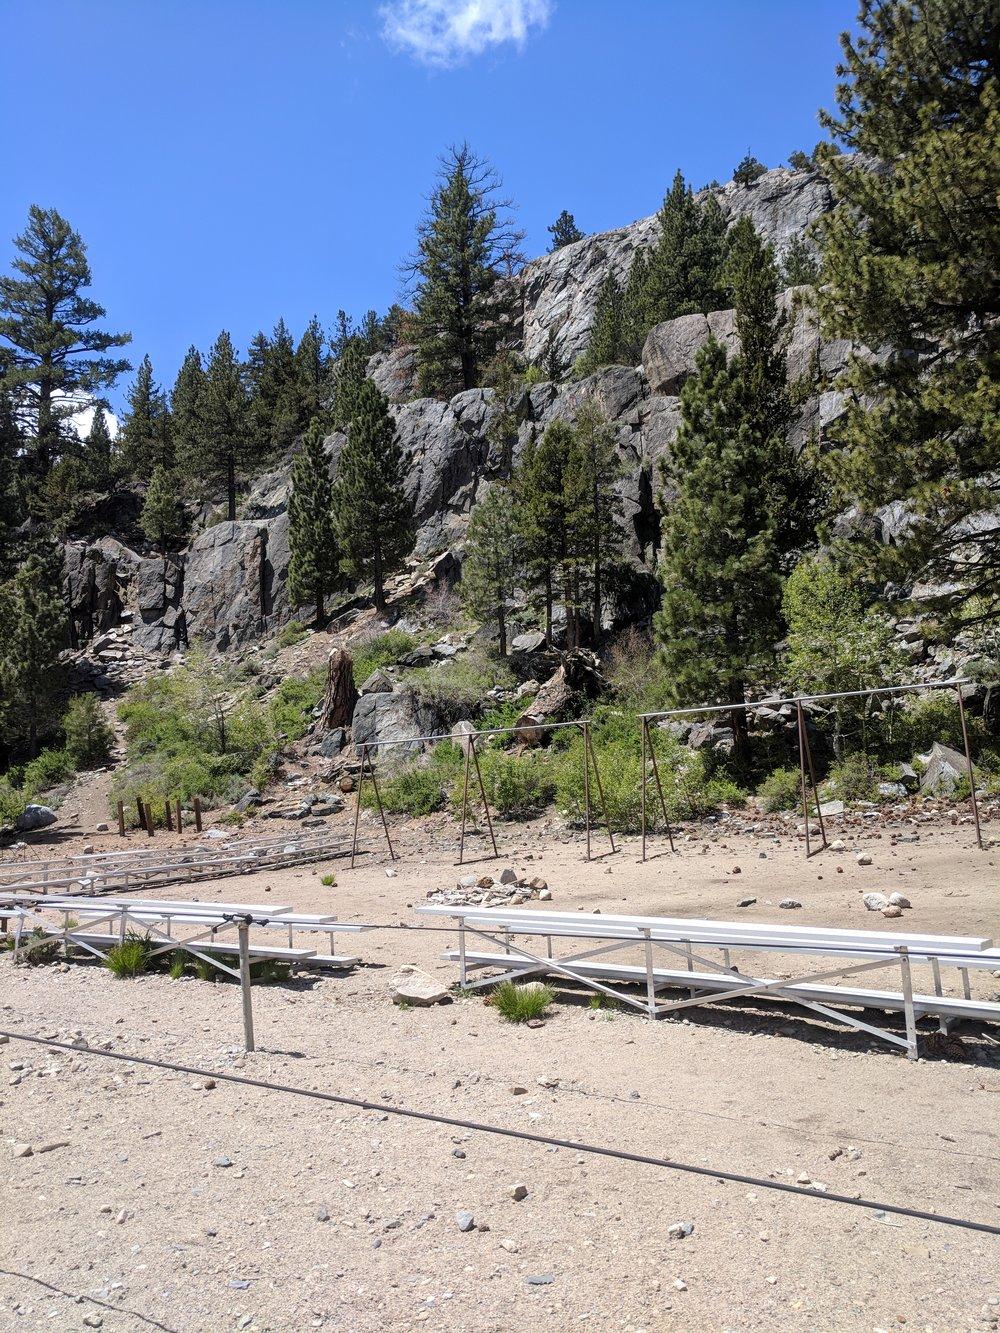 Levitt Training Area - Marine Corps Assault Climbers Course